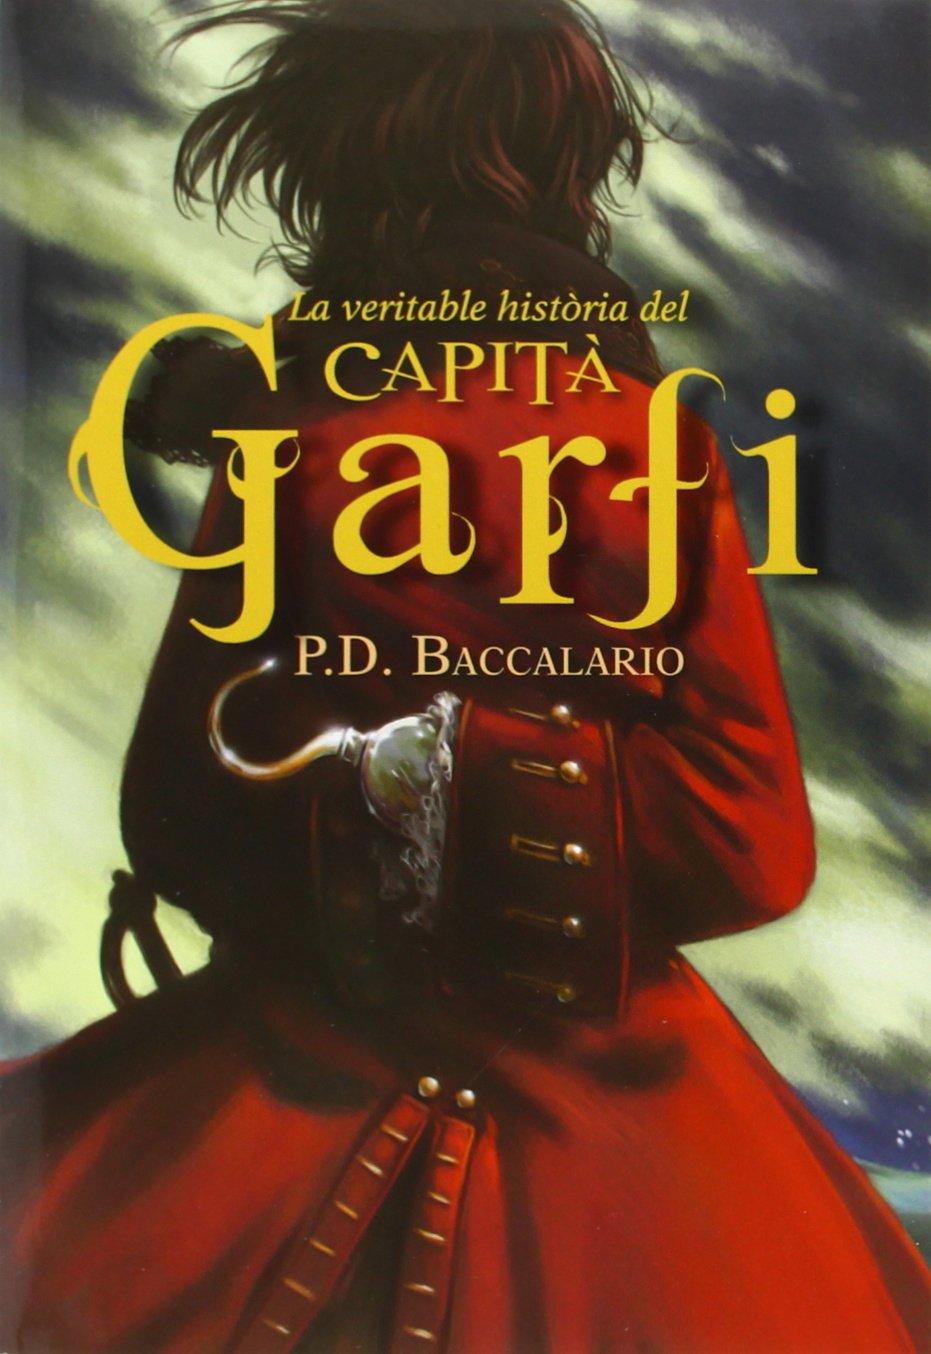 La veritable història del capità Garfi (P. D. Baccalario)